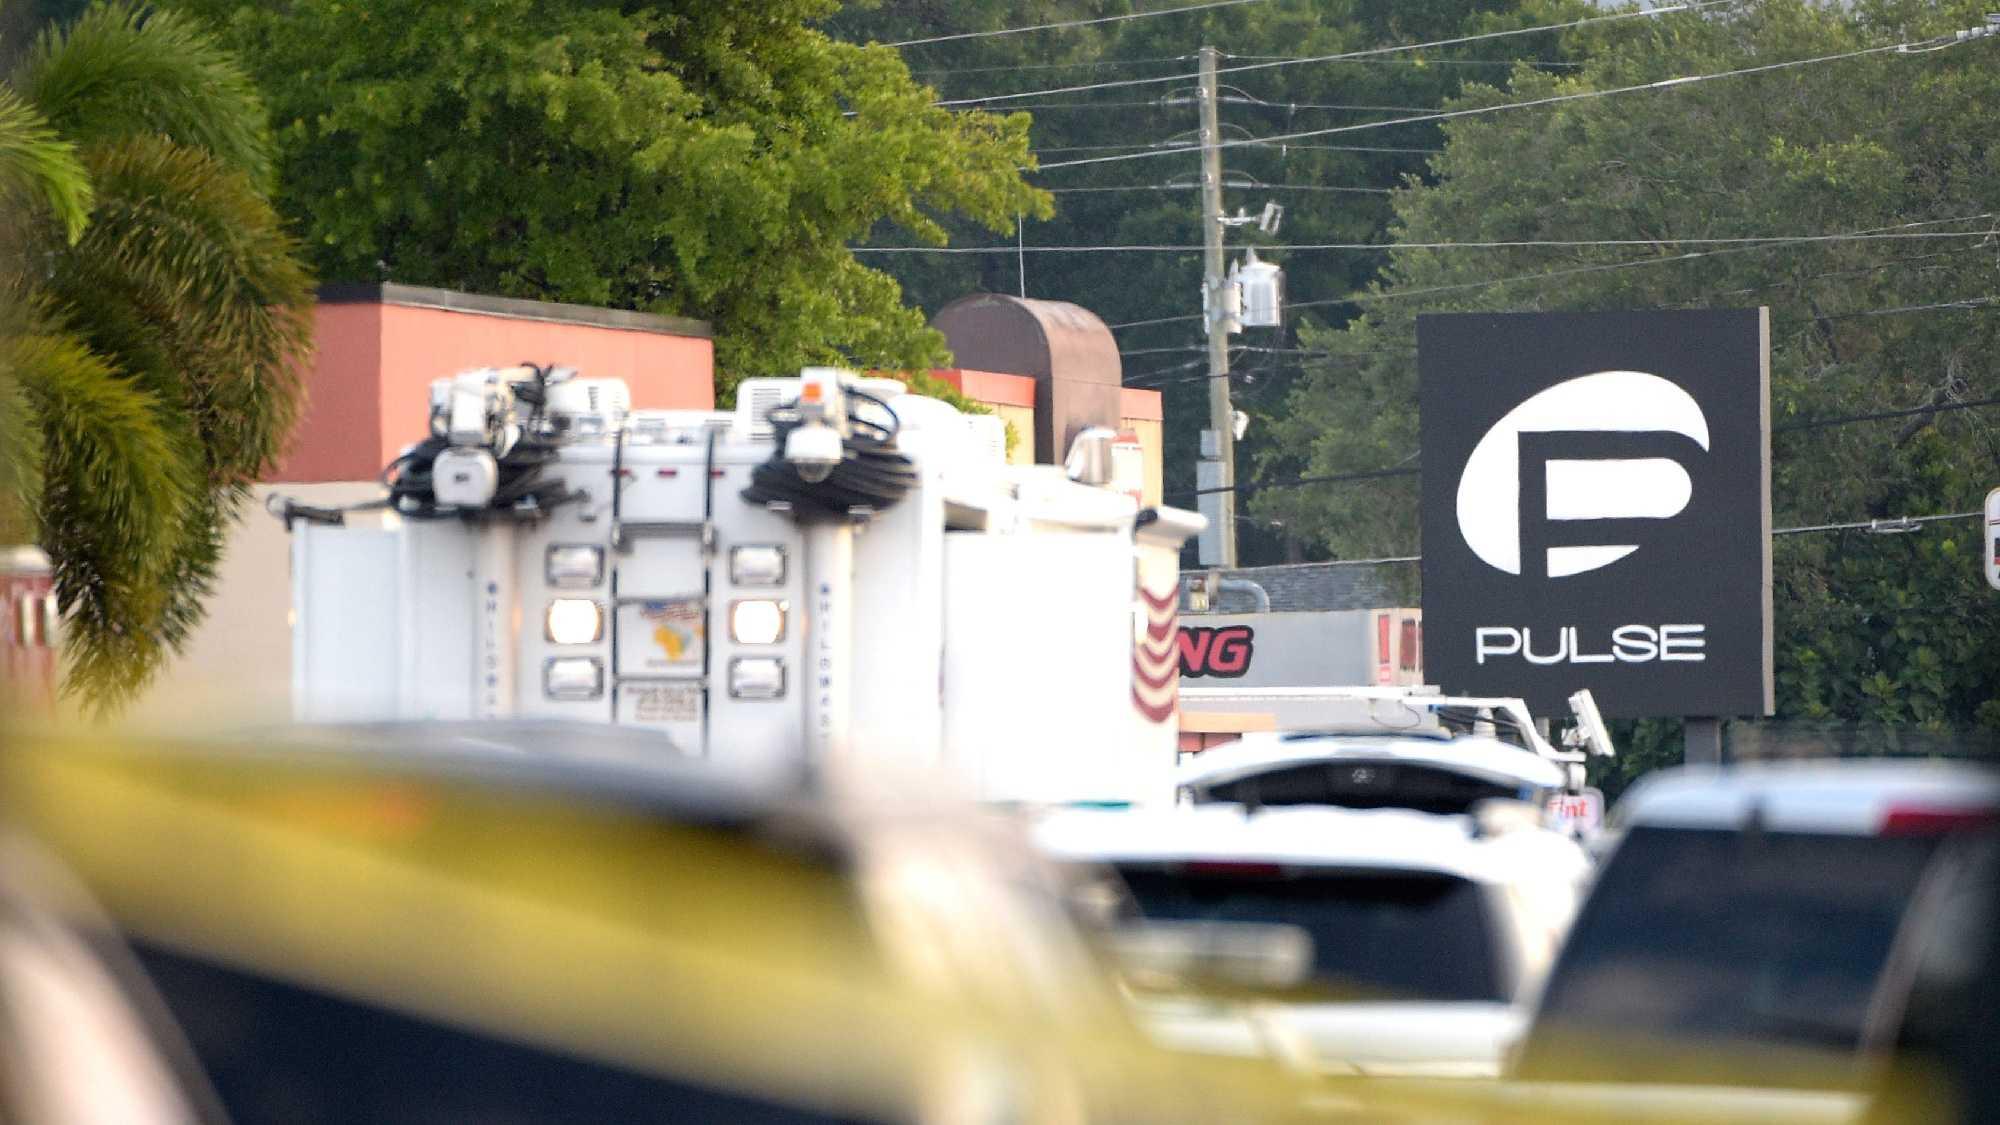 Pulse shooting investigation